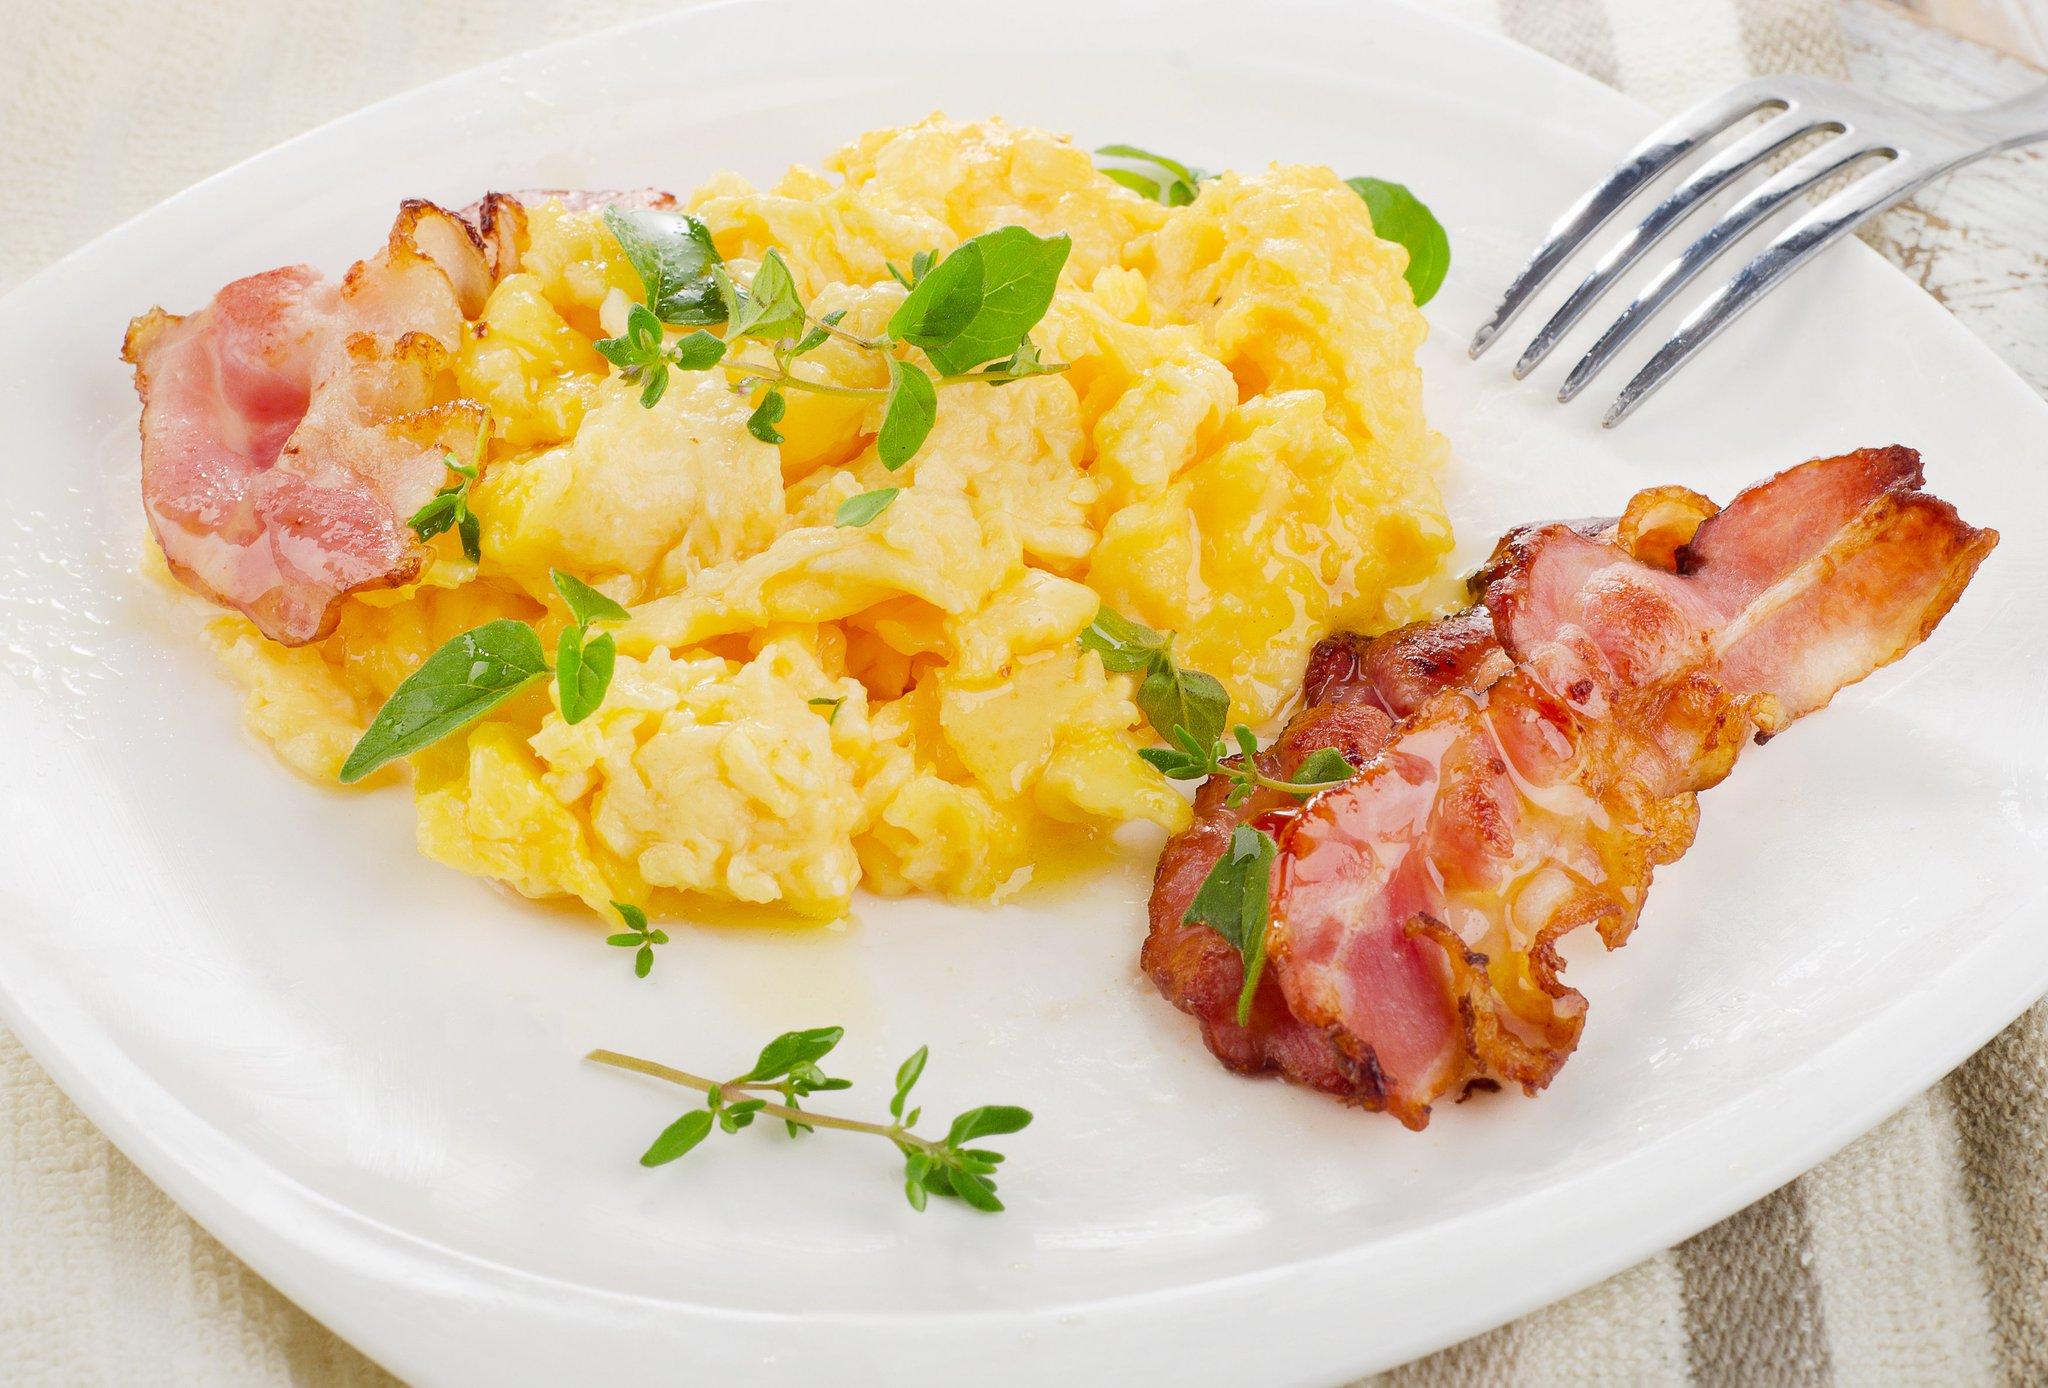 Bacon Scrambled Eggs